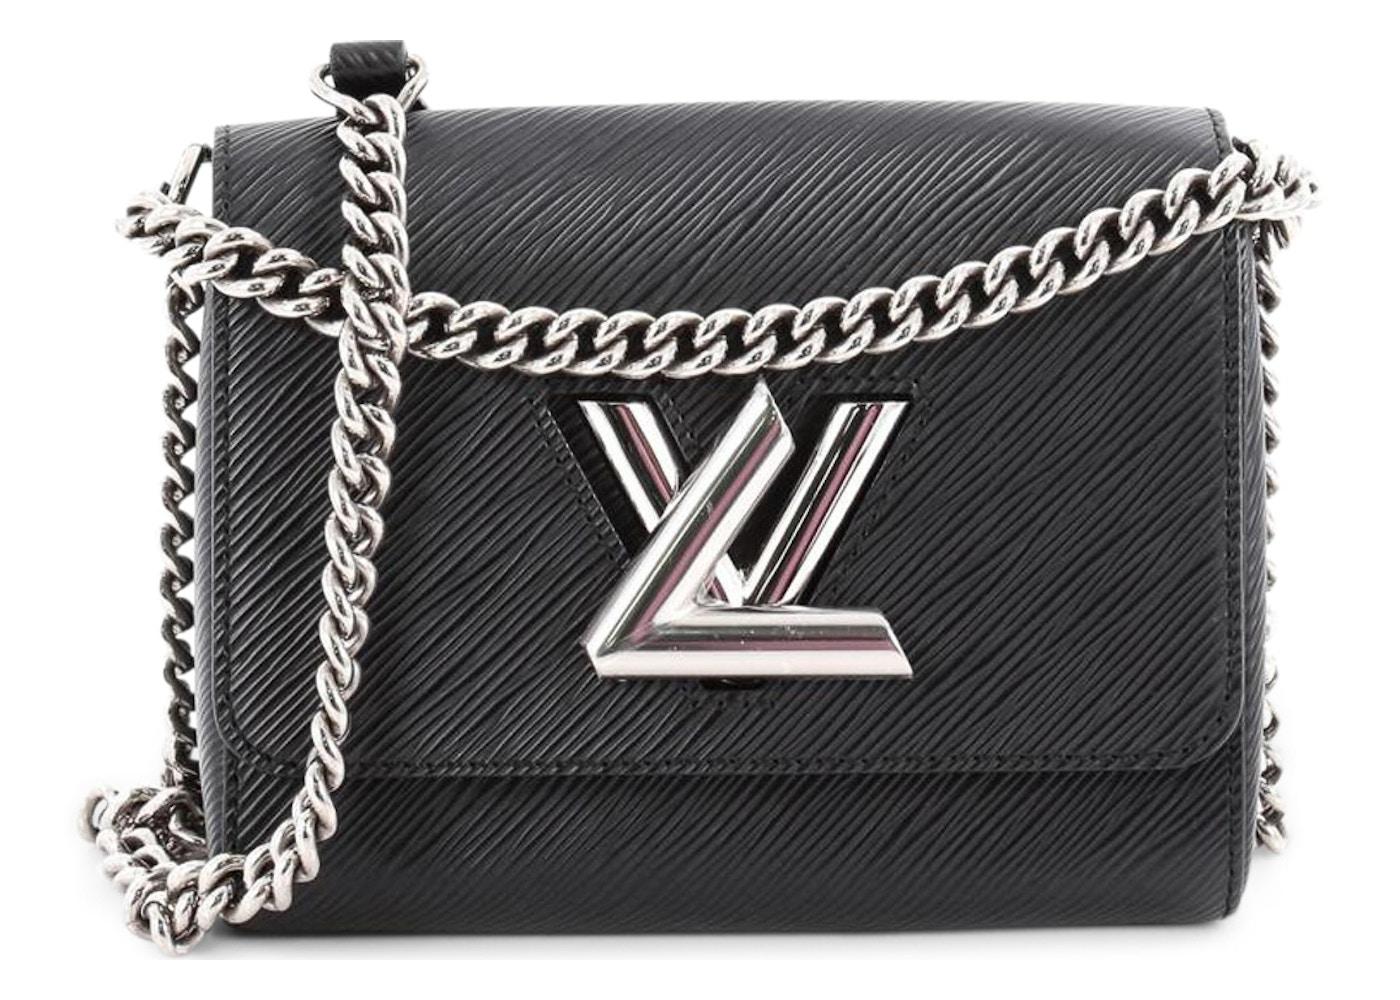 6f7711451724c Louis Vuitton Handbag Twist Epi PM Black. Epi PM Black